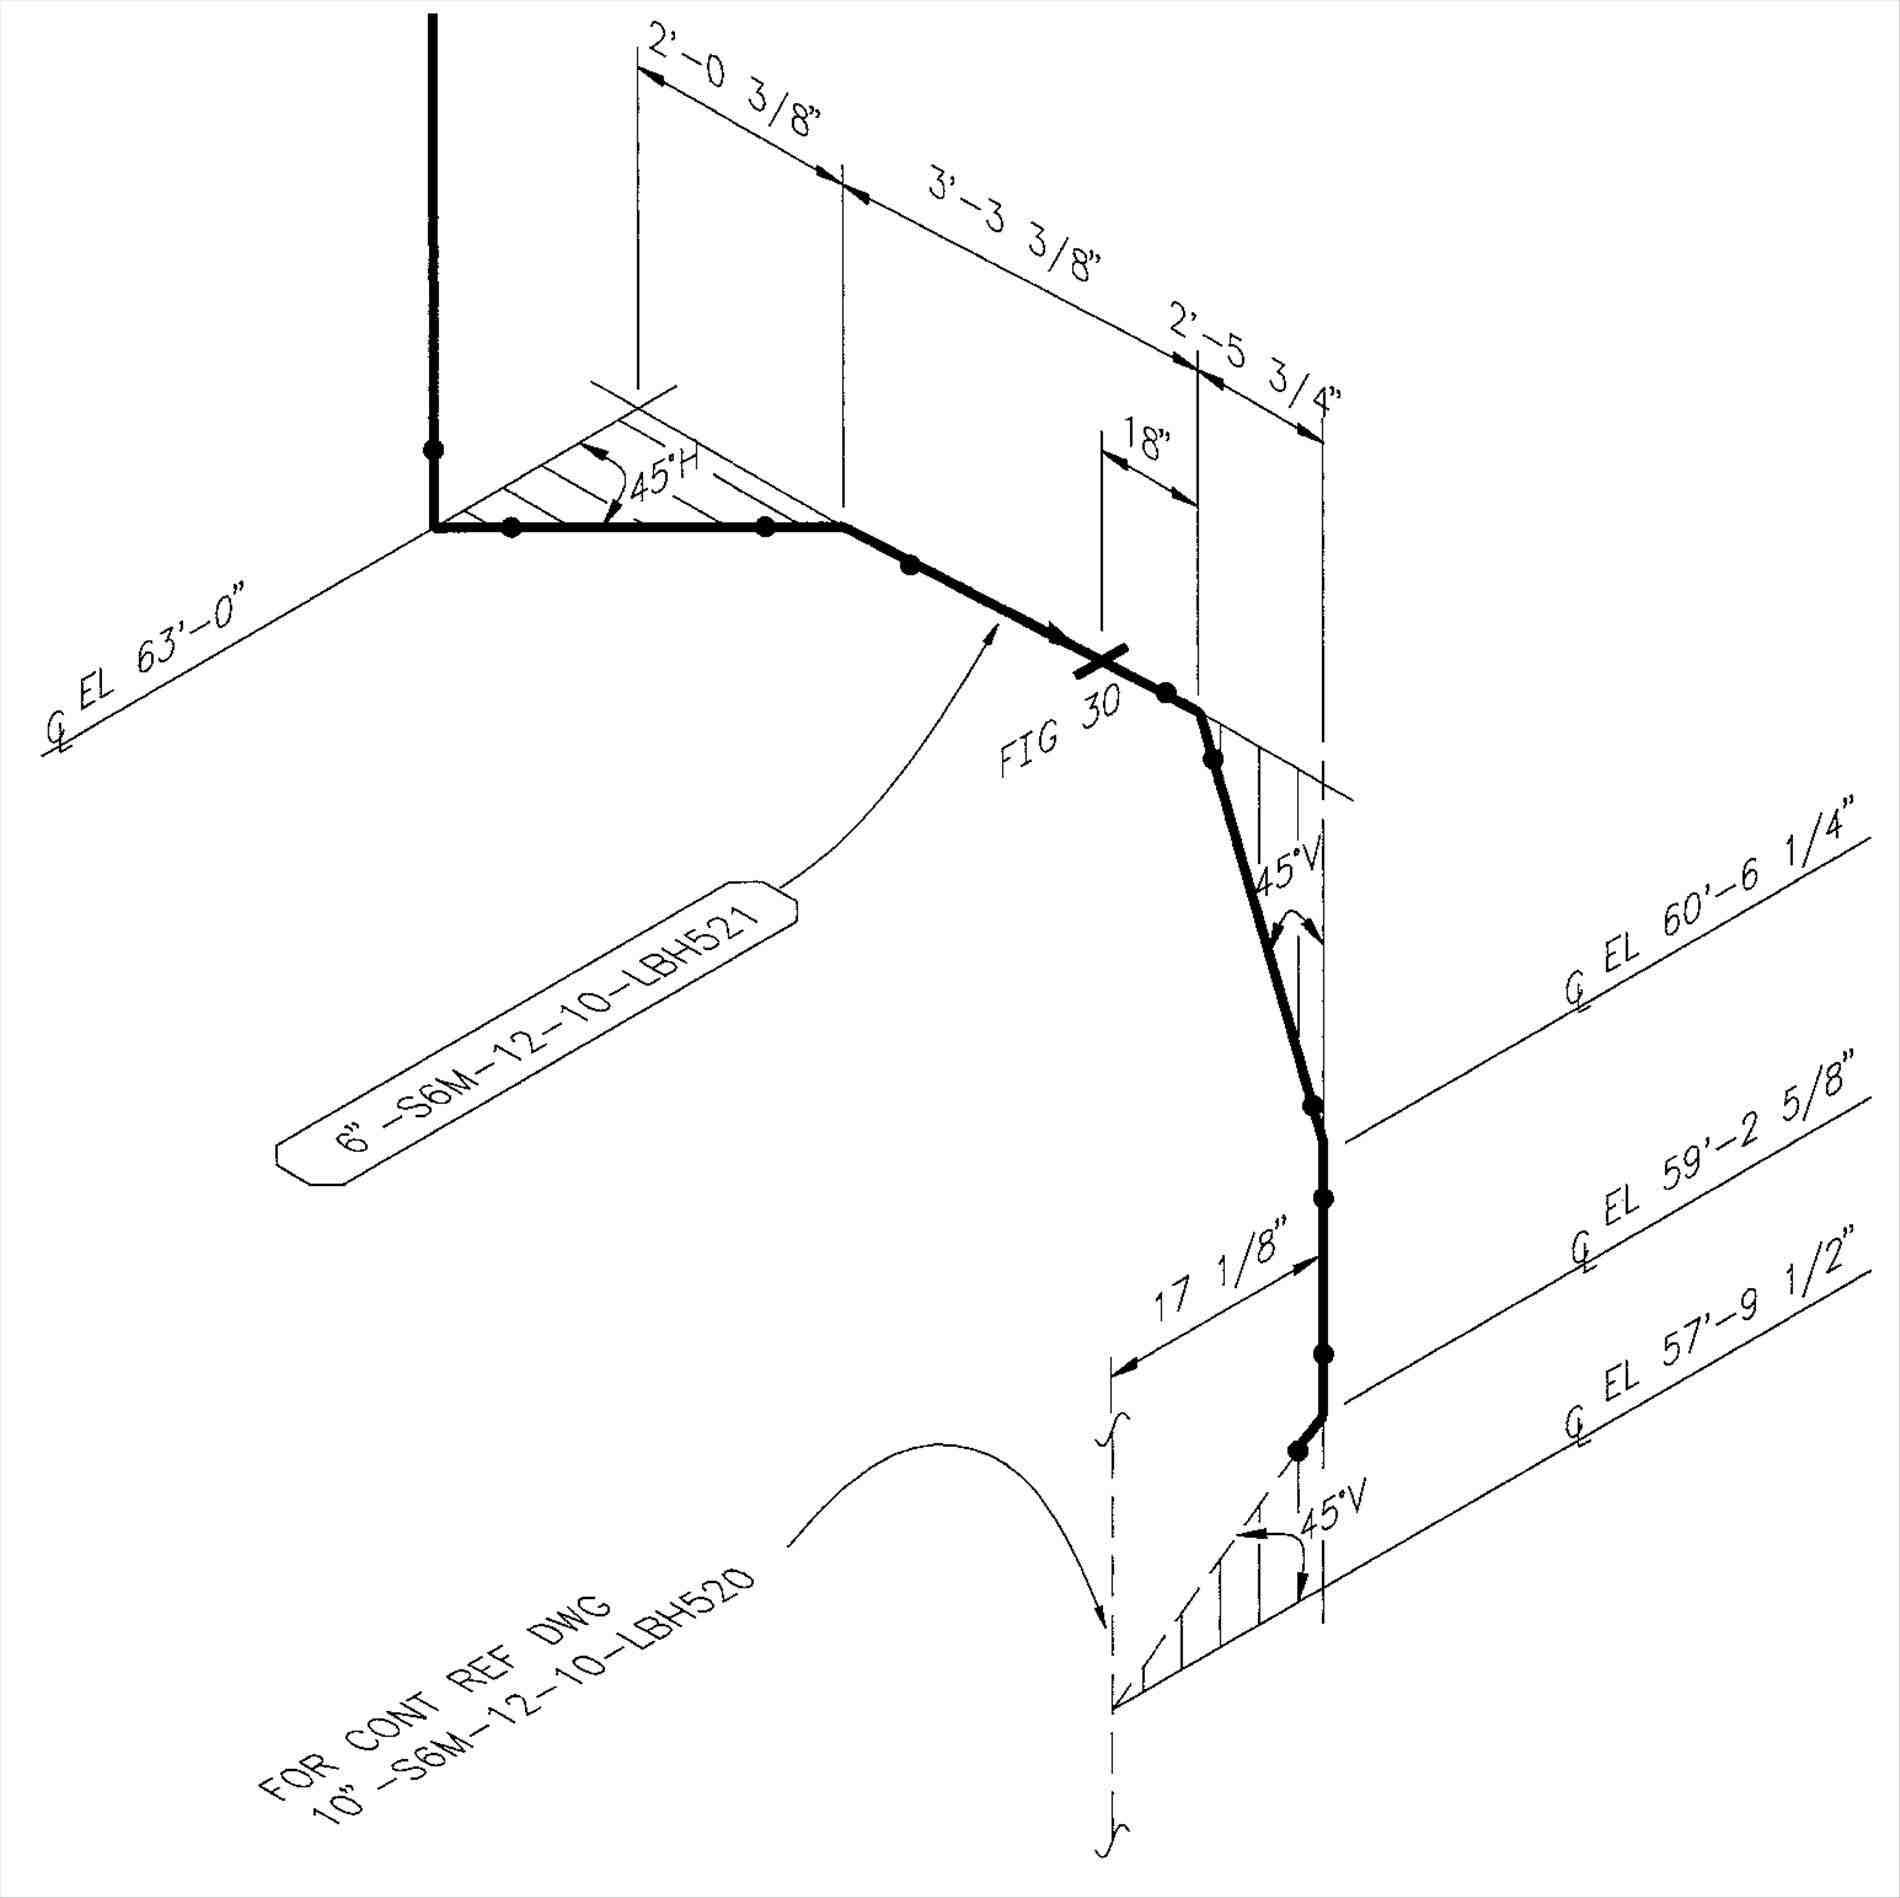 Pipe Drawing At Getdrawings